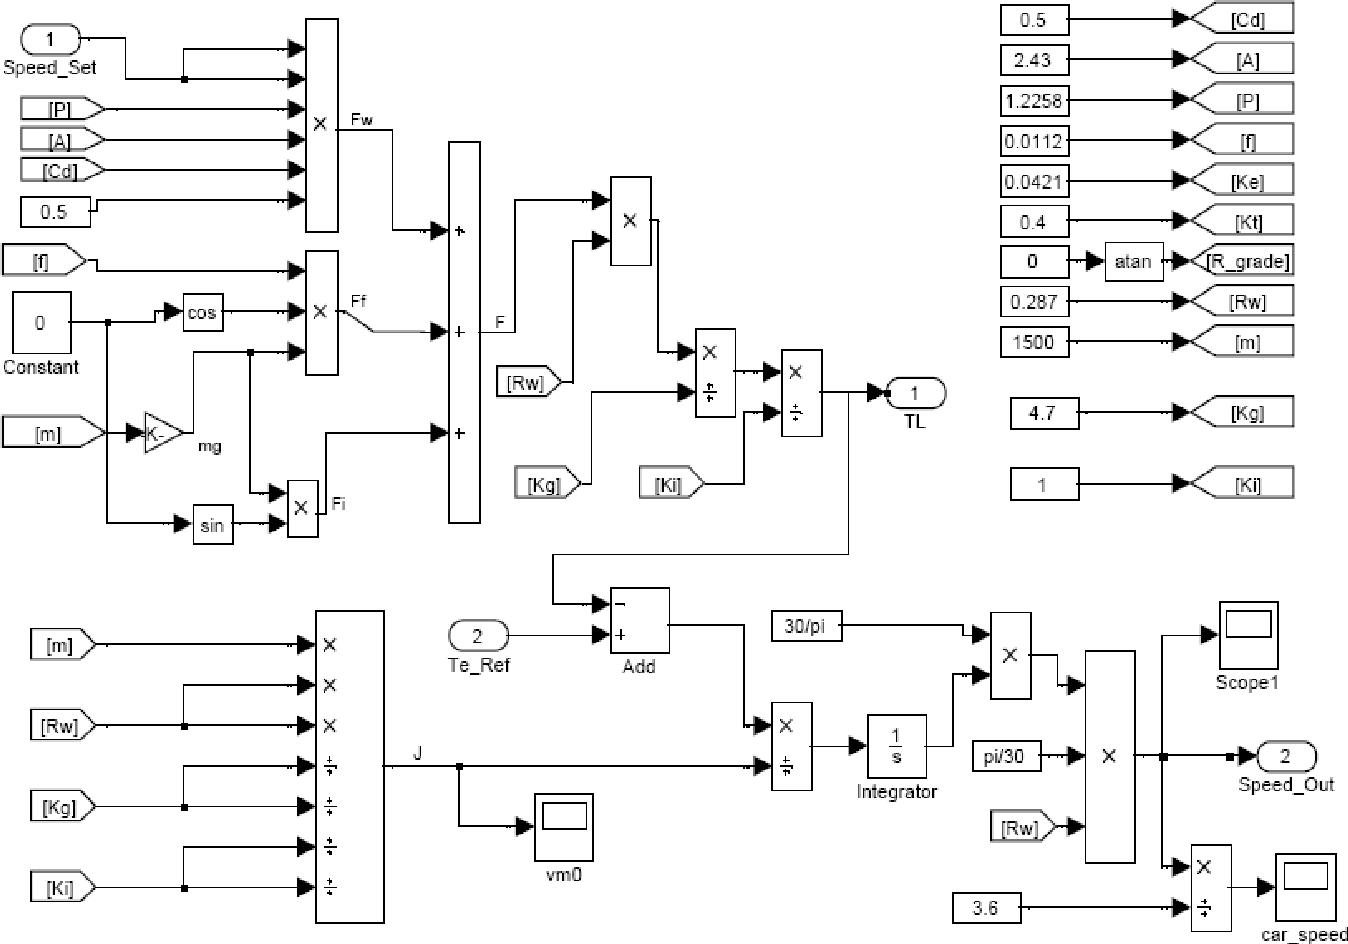 Energy Regenerative Braking Control Of Electric Vehicles Using Three Ac Motor Speed Picture Figure 3